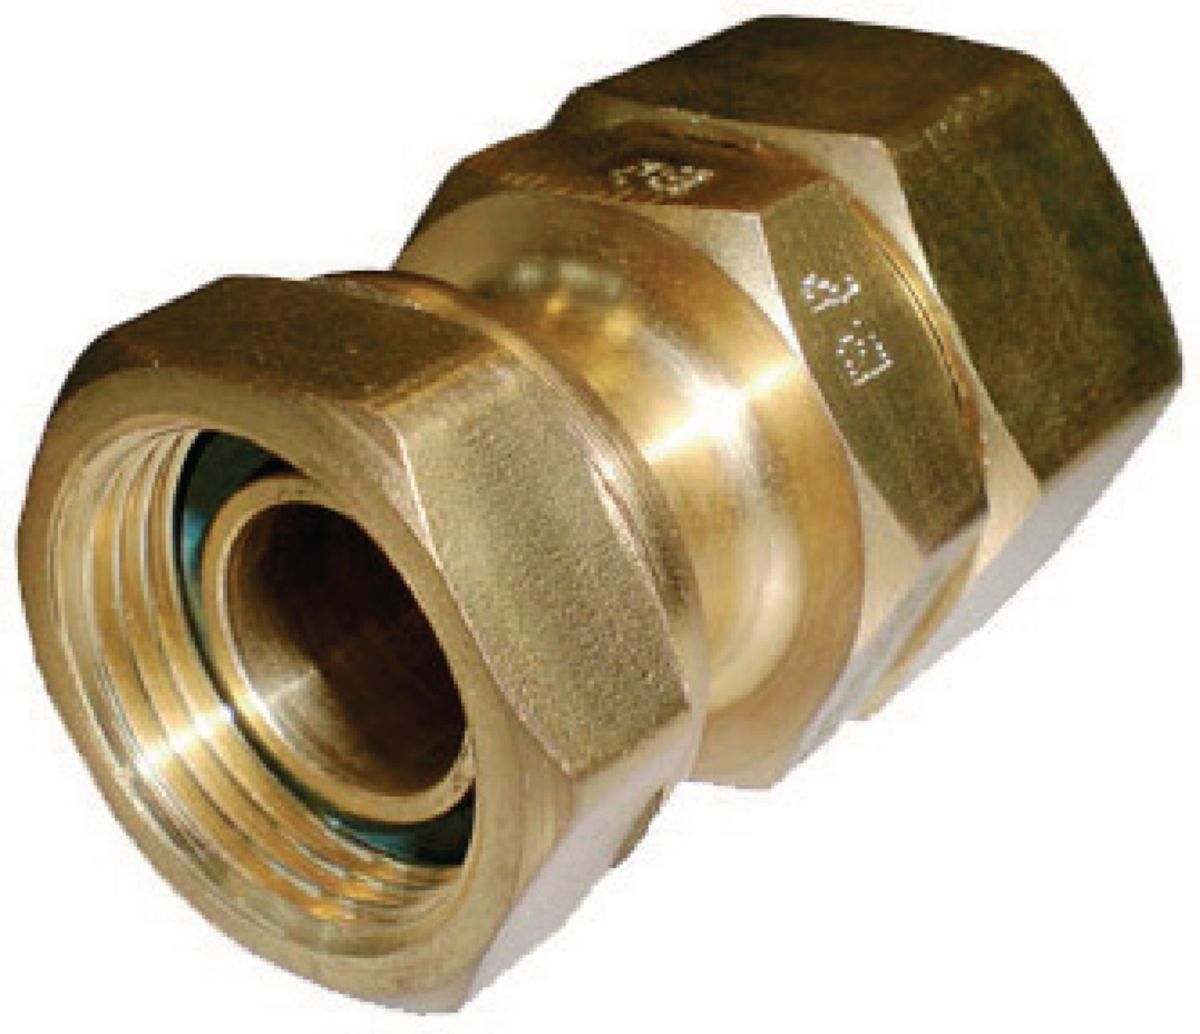 Raccord PLT TRACPIPE, joint plat gaz, femelle D15x21-15 réf 3311512